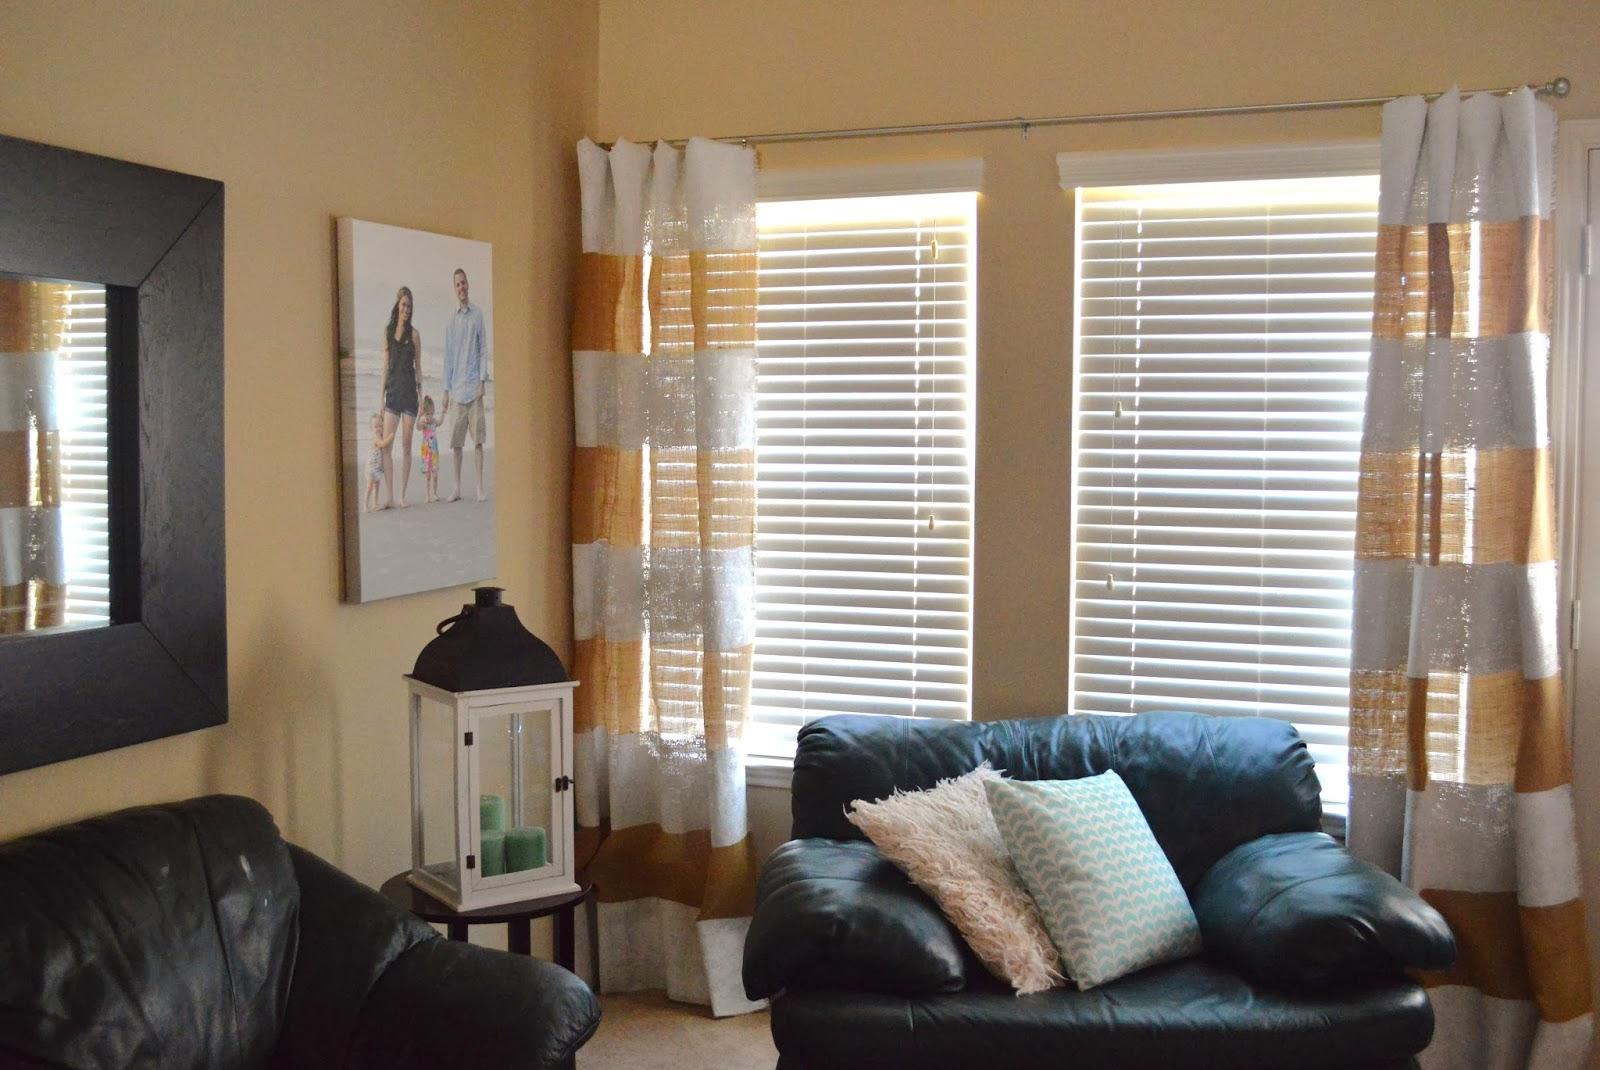 A DIY Life Striped Burlap Curtains